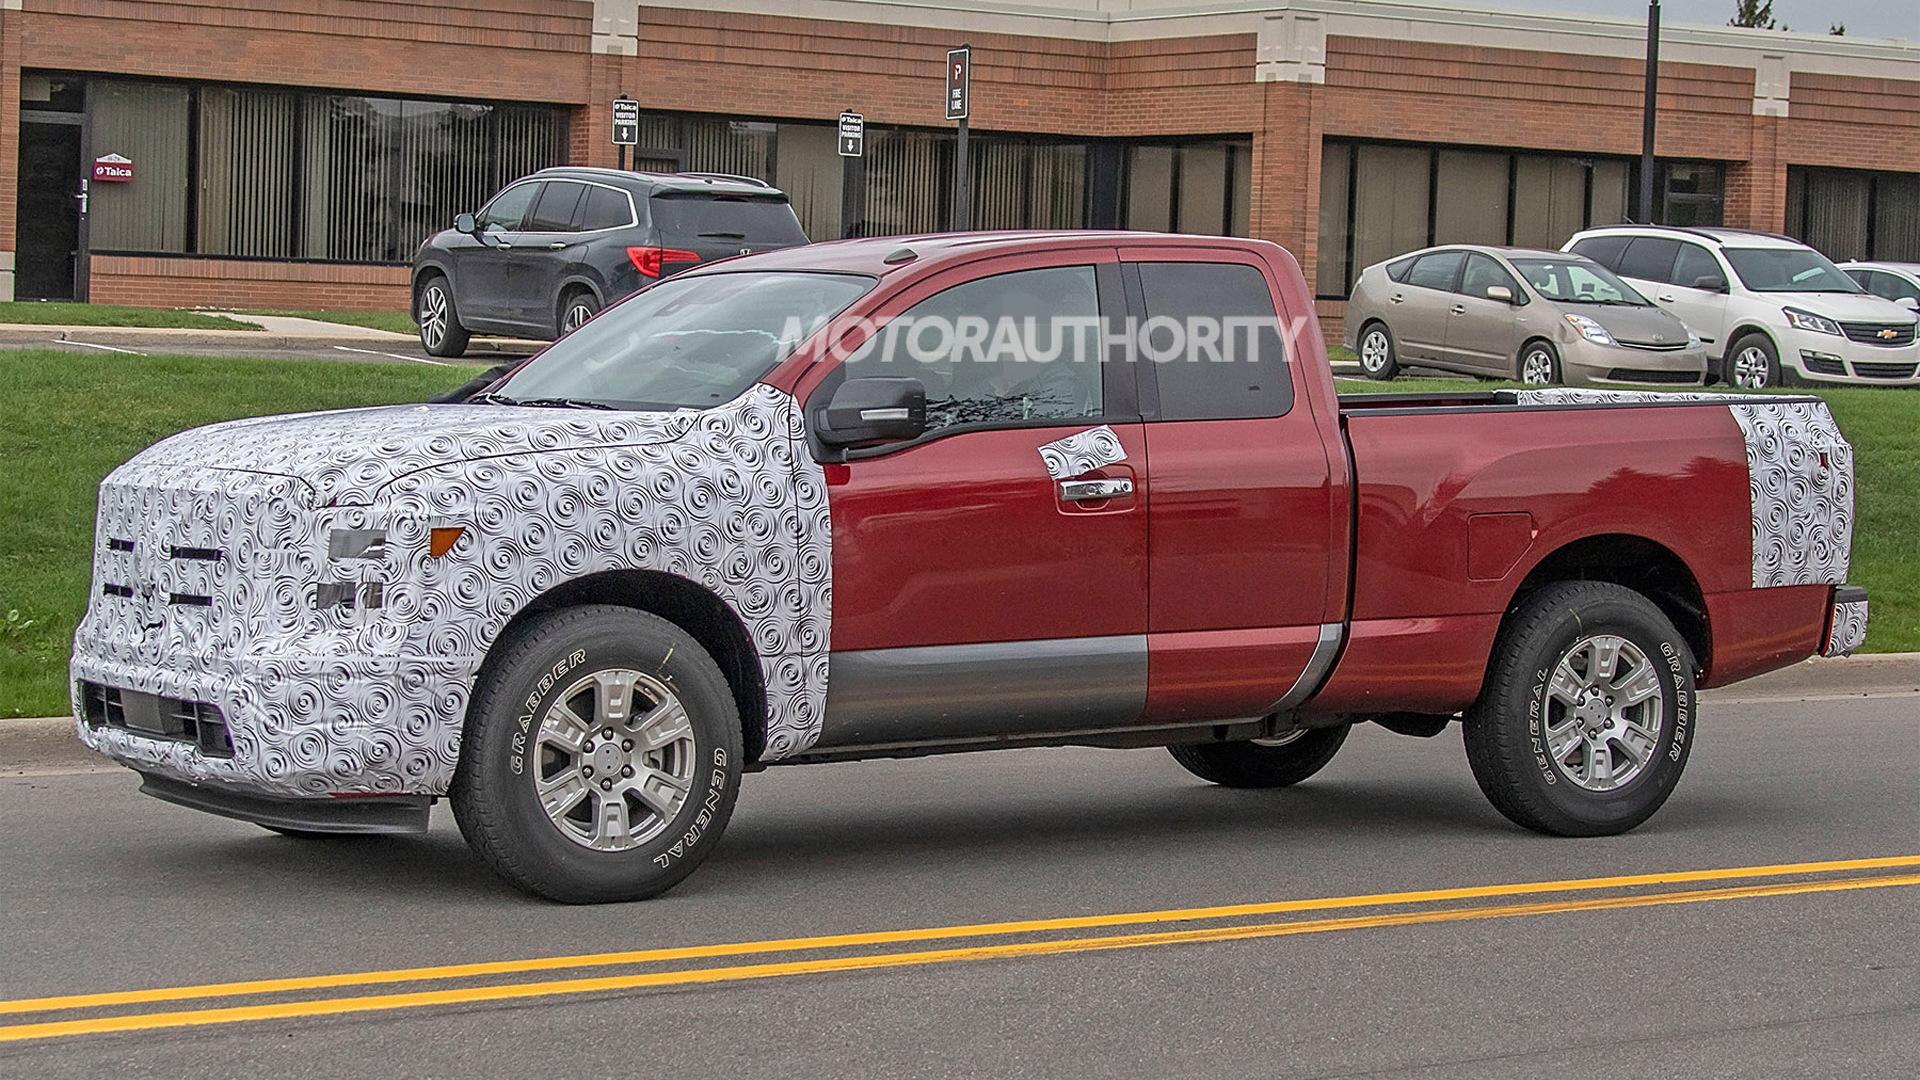 2020 Nissan Titan facelift spy shots - Image via S. Baldauf/SB-Medien